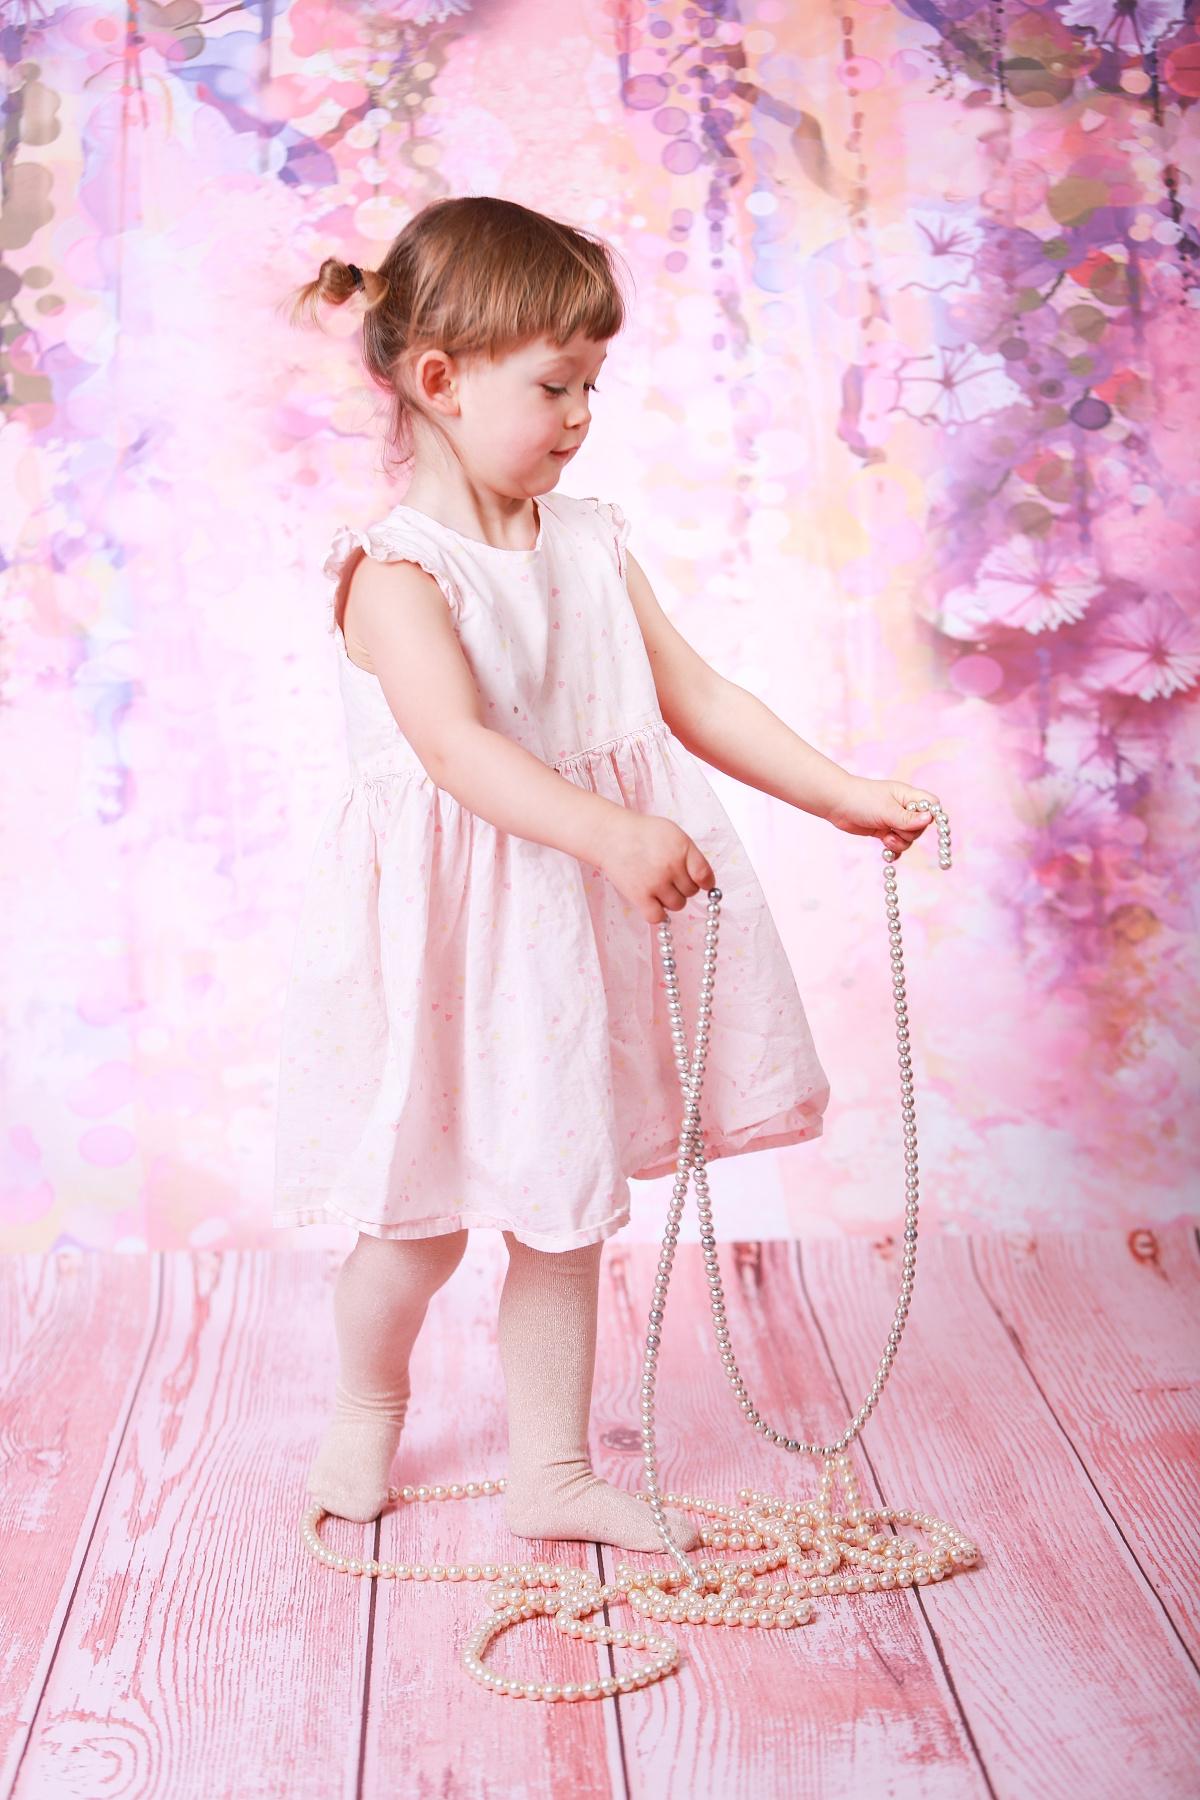 detska-FOTOGRAFIE-JITKAMADEROVA-001